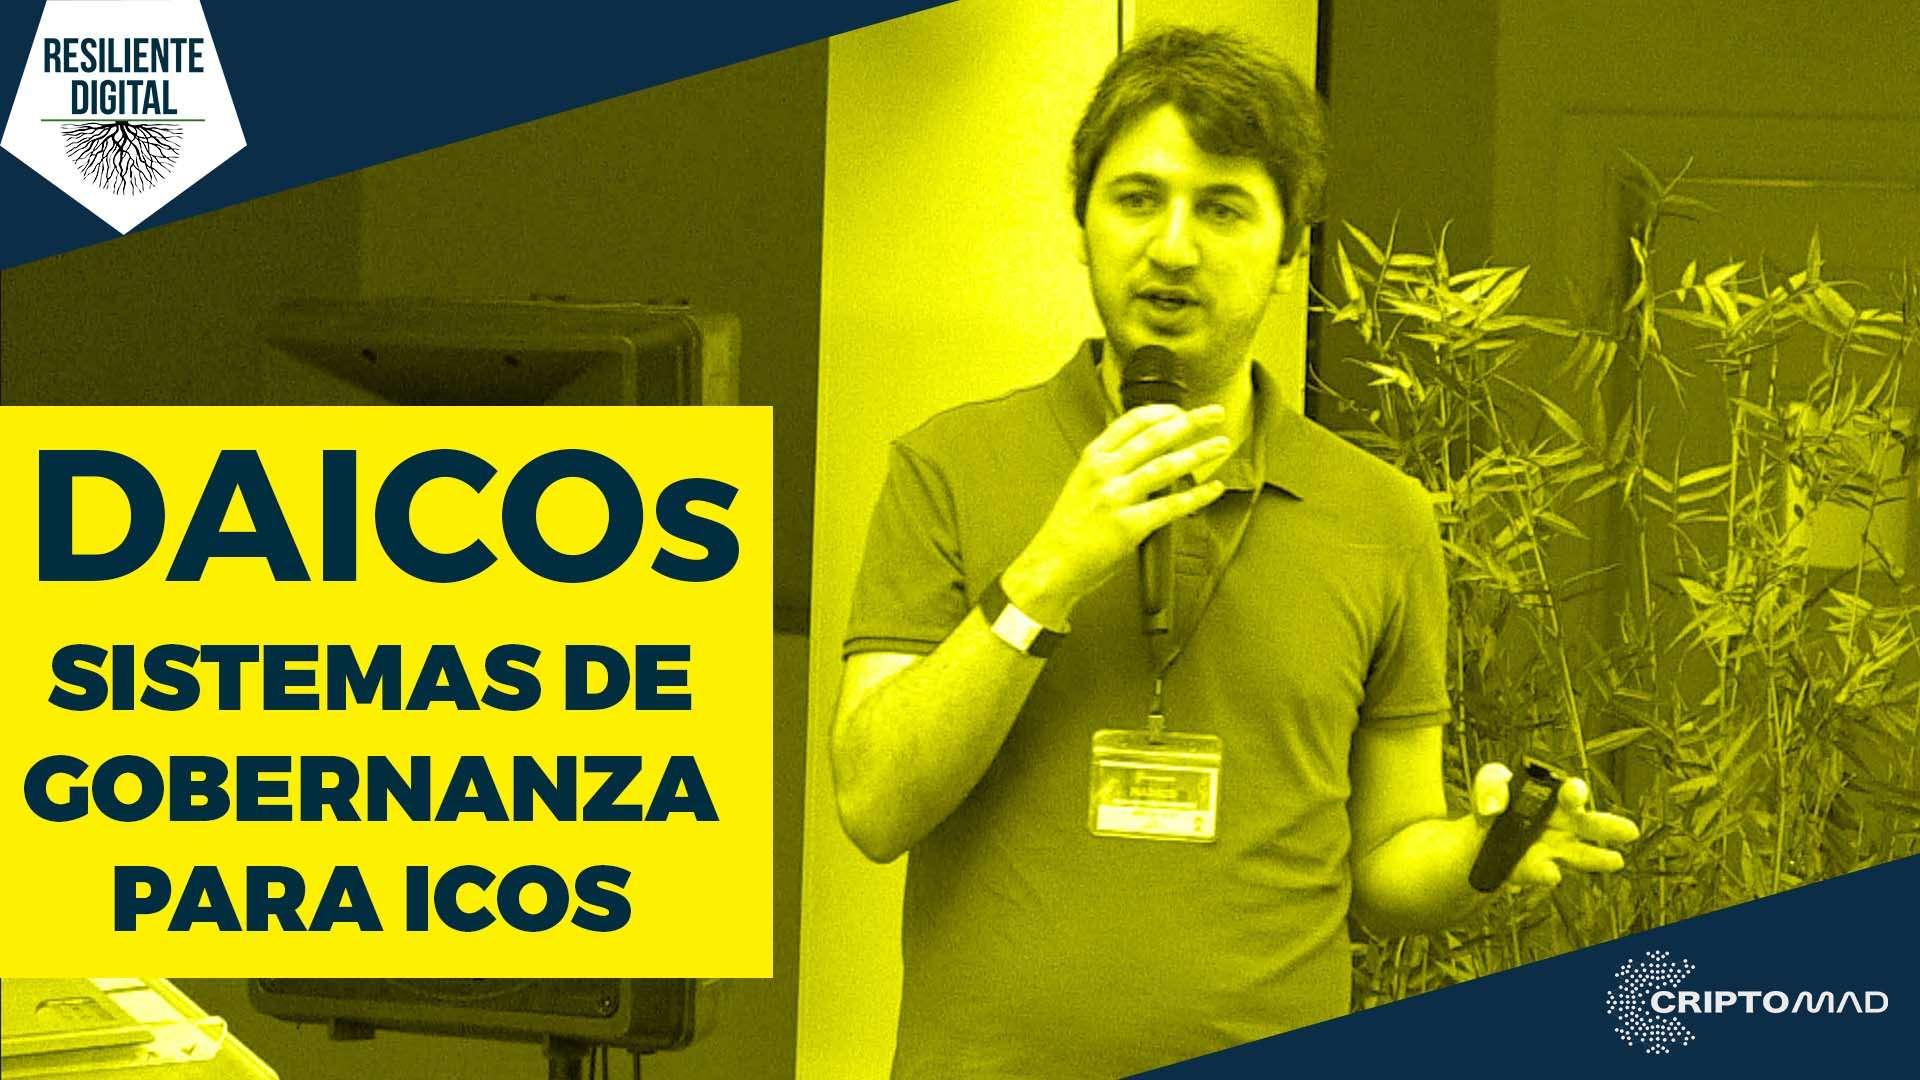 Sistemas de Gobernanza para ICOs: DAICO y CGS (Coin Governance System)